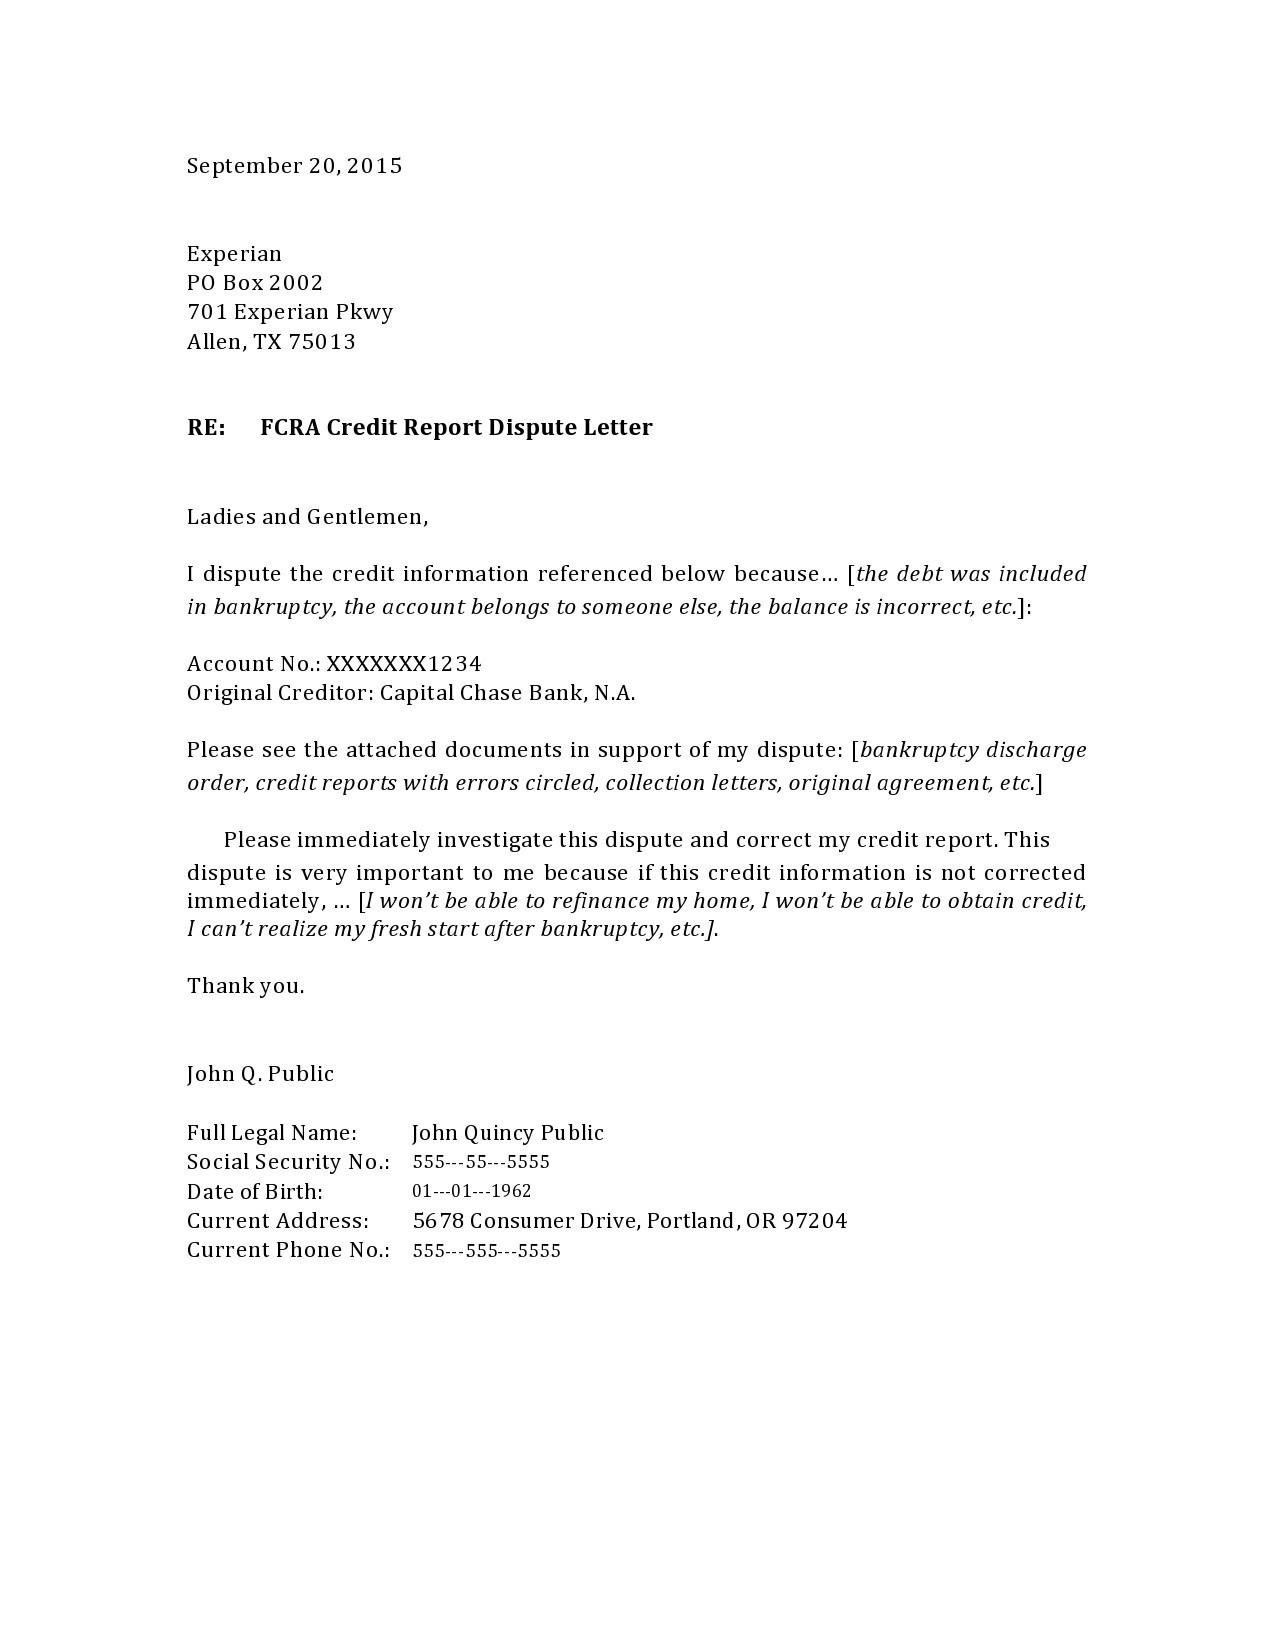 Free credit dispute letter 31